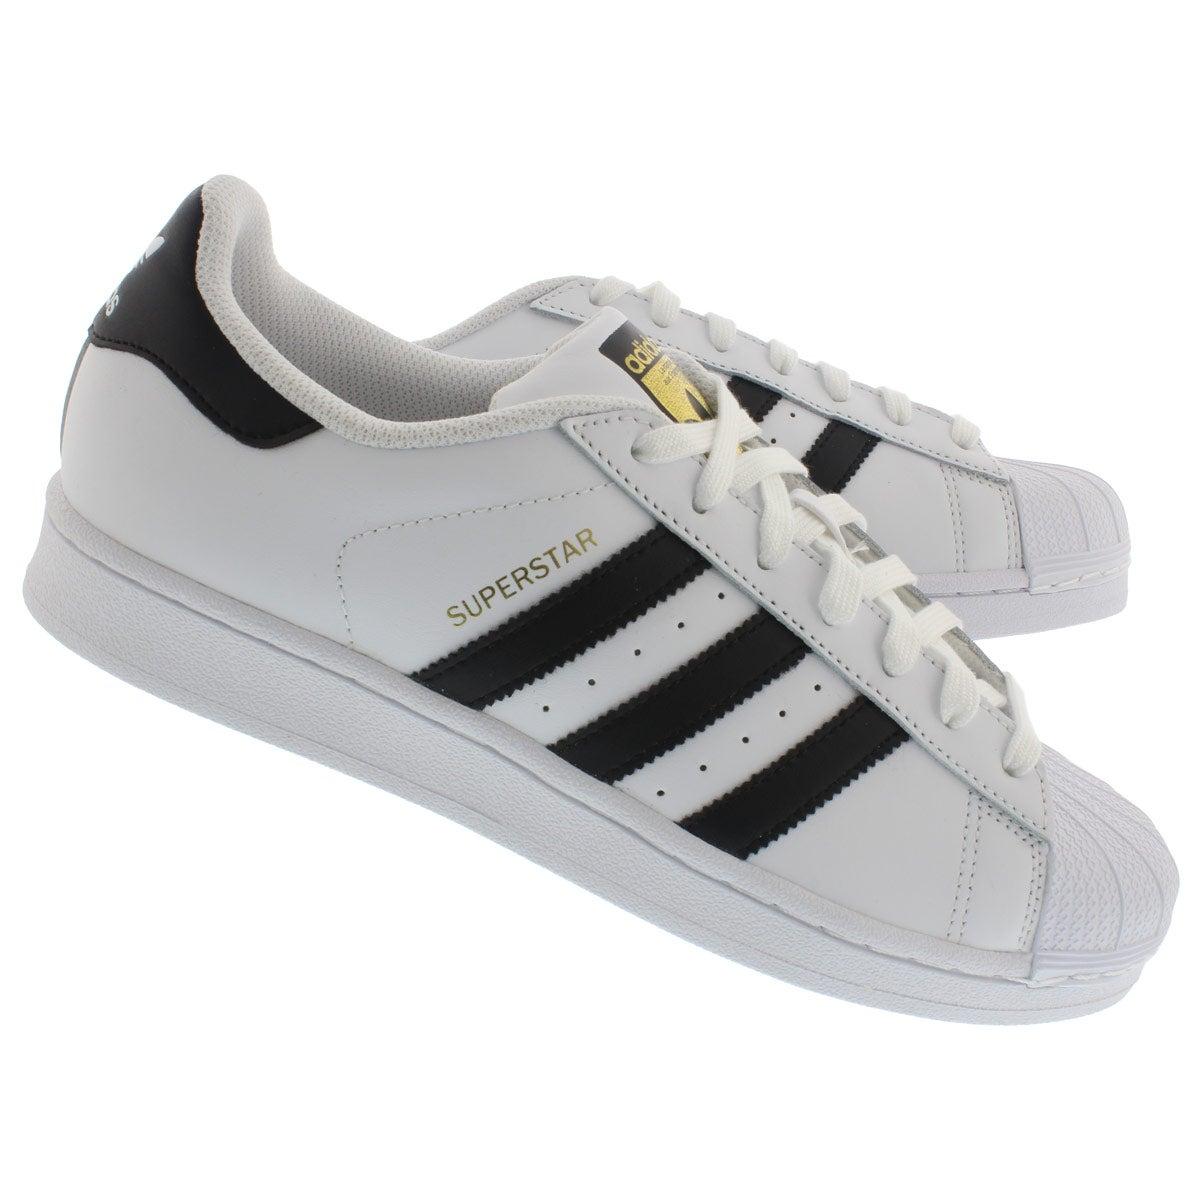 Espadrilles Superstar, blanc/noir, hom